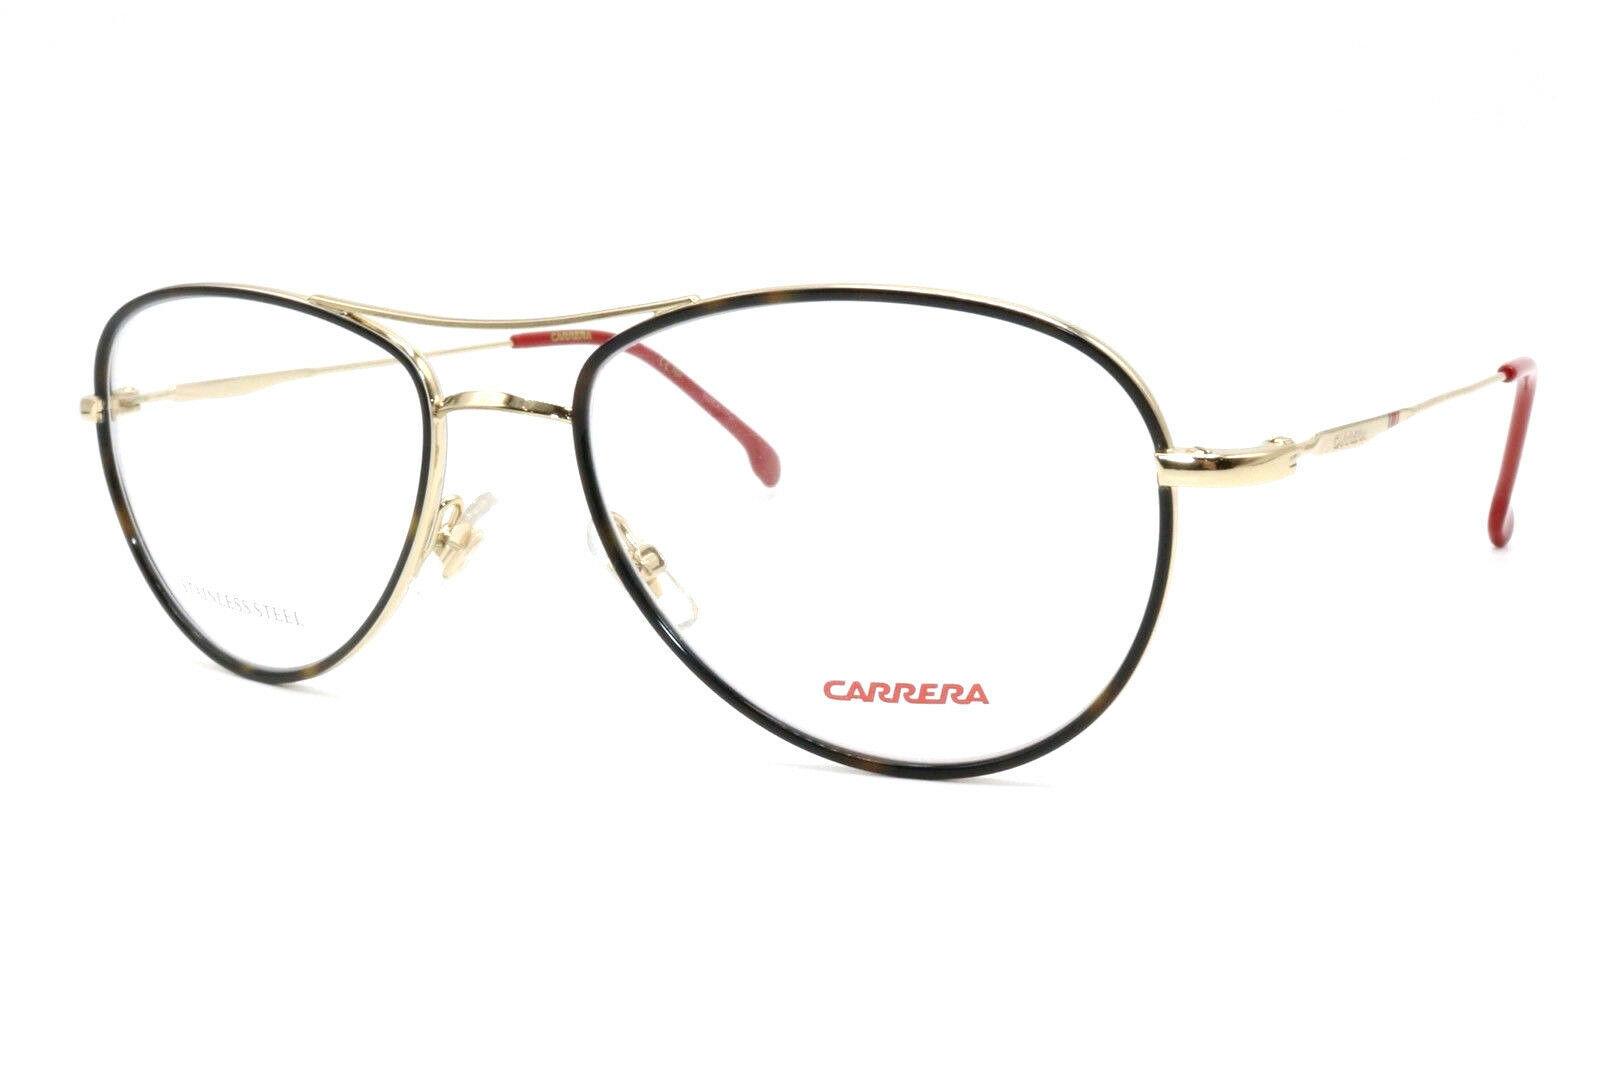 New Authentic Carrera 169/V 06J Tortoise Gold Men's Eyeglasses 54-18-140 W/Case - $88.11